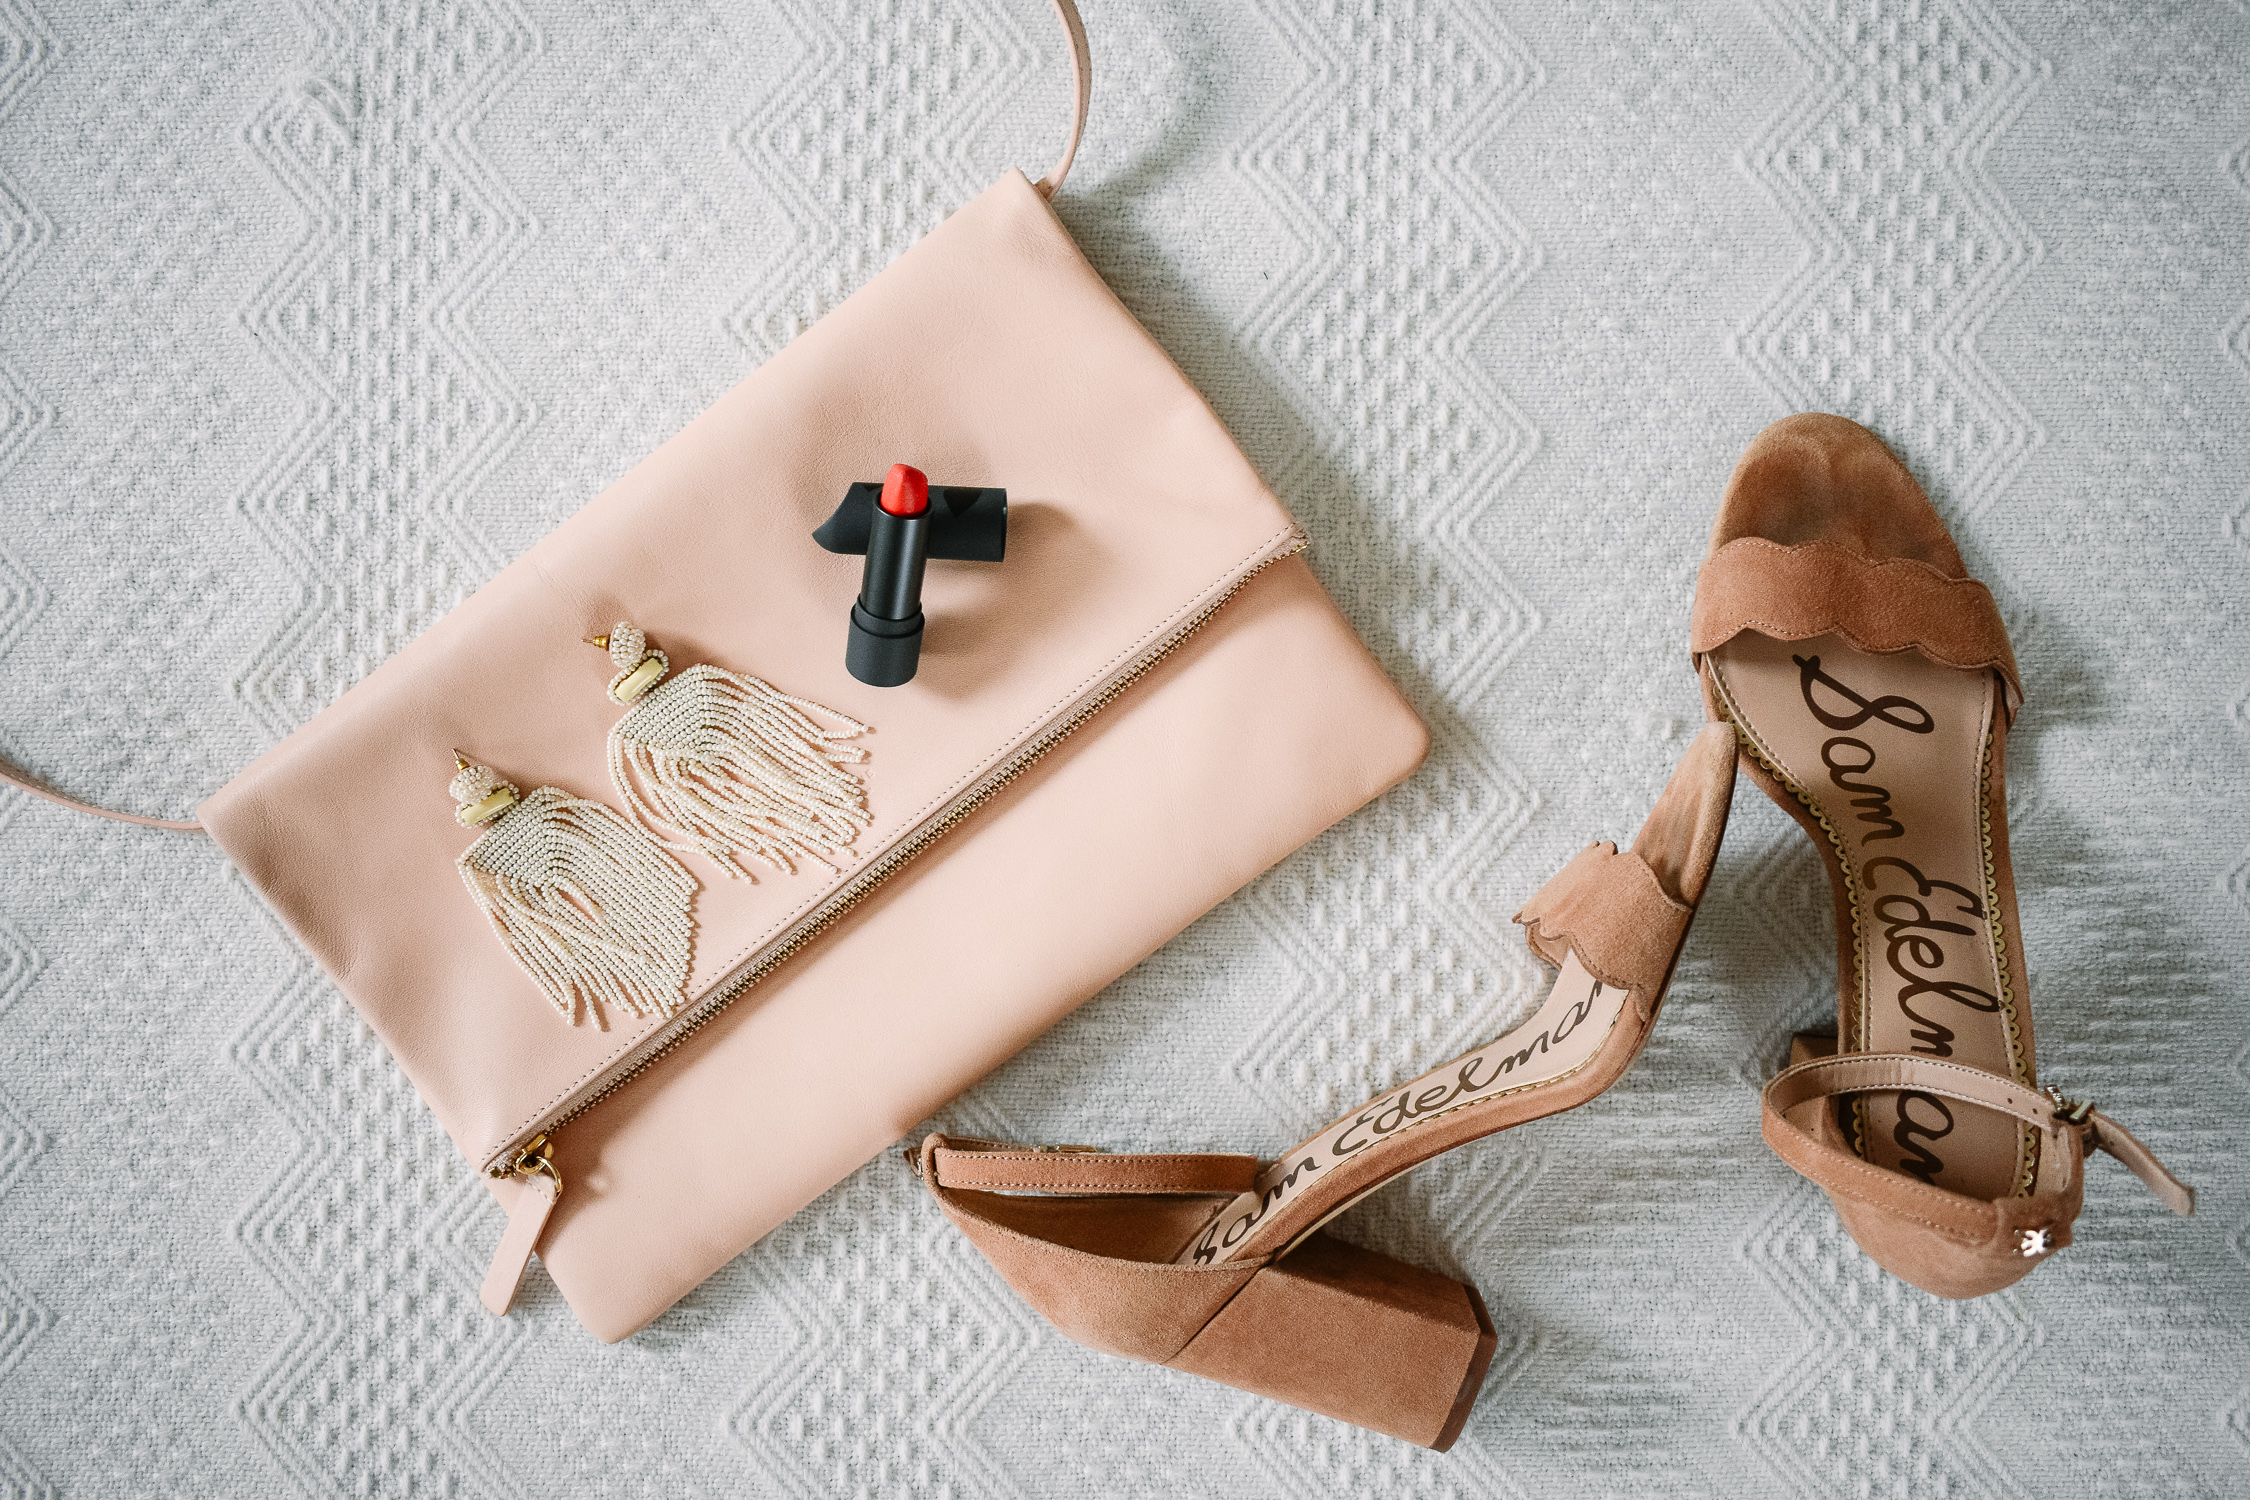 Statement earrings, bold lipstick, nude purse + sandals